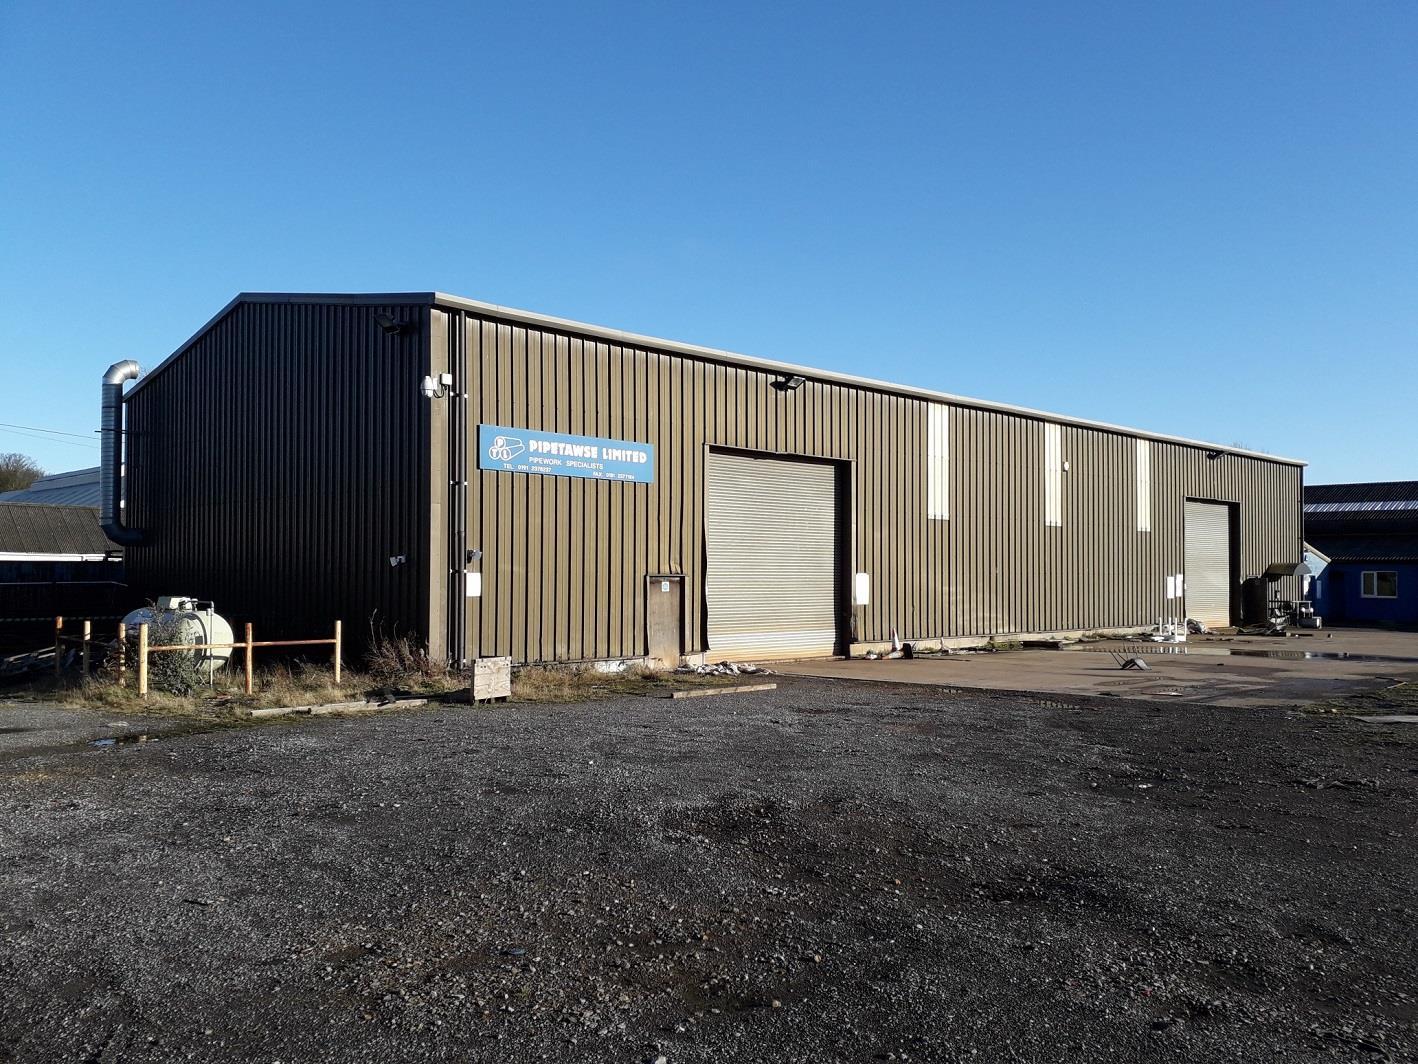 Former Pipetawse Premises, Double Row, Seaton Delaval, North East, NE25